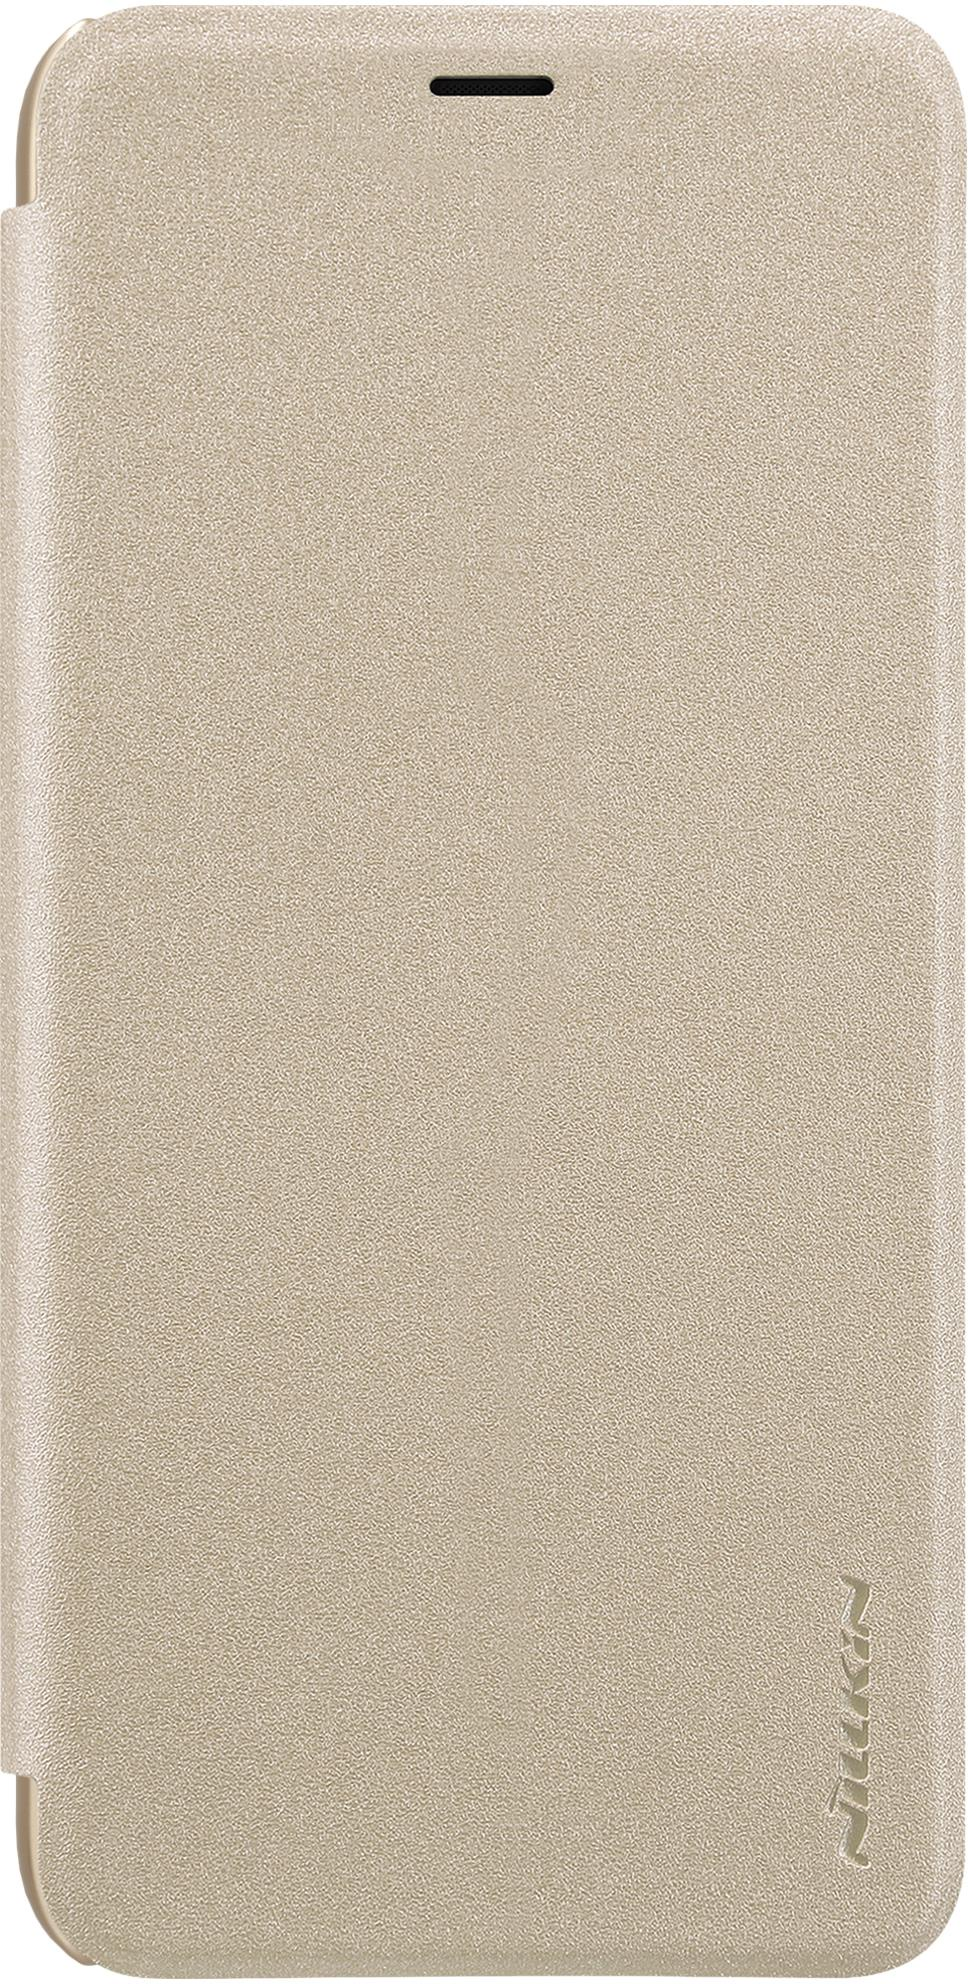 Чехол для сотового телефона Nillkin Sparkle, 6902048159013, золотой чехол для сотового телефона nillkin sparkle 6902048161108 золотой